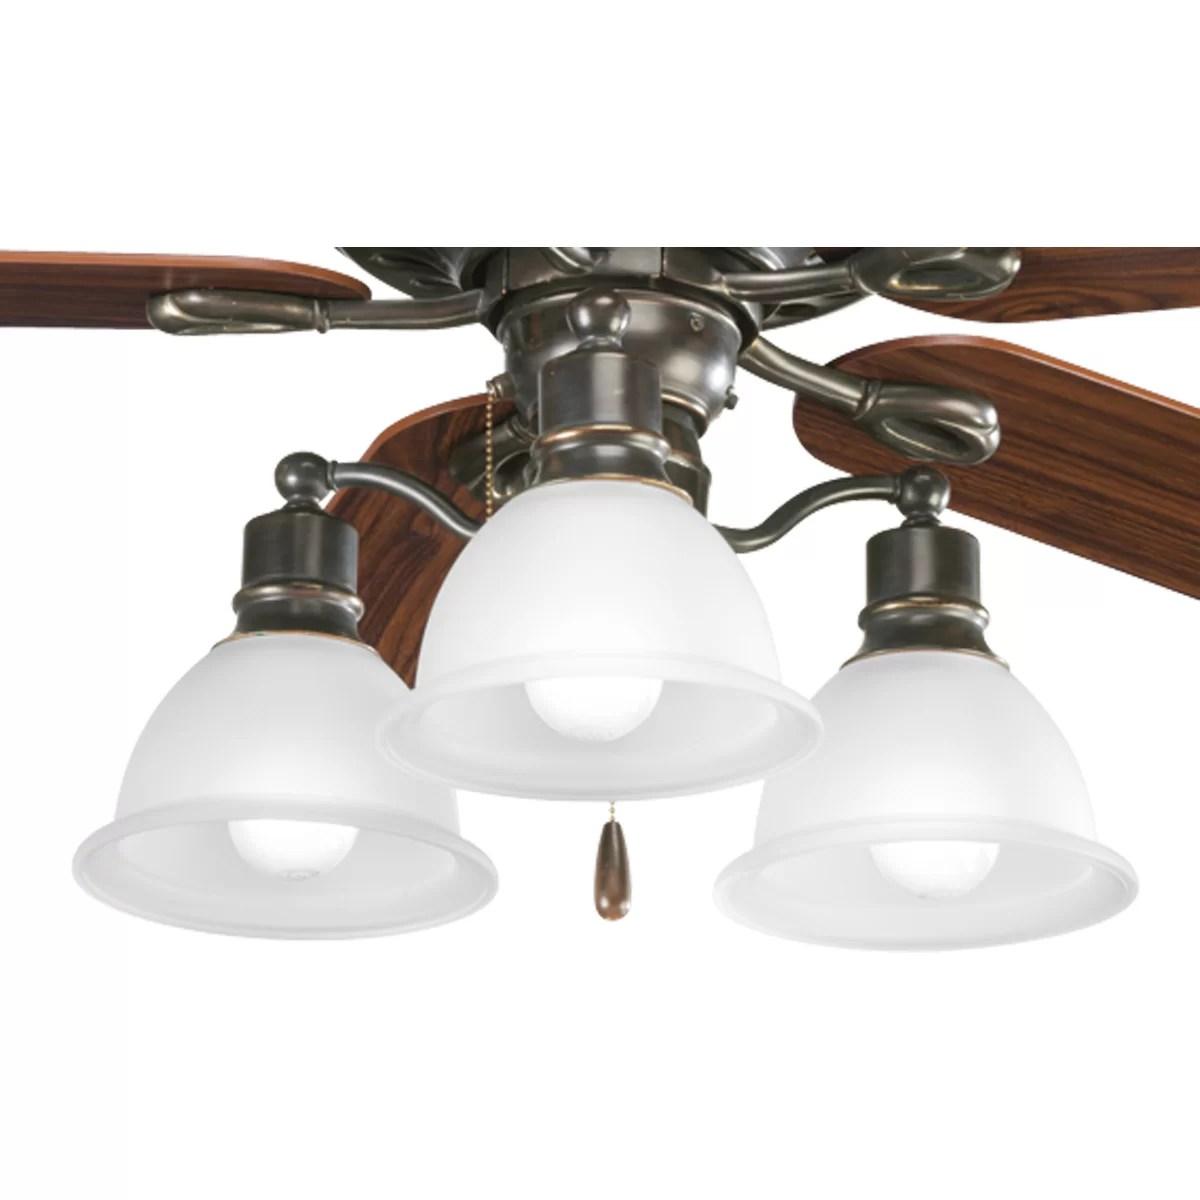 Progress Lighting Madison 3 Light Branched Ceiling Fan